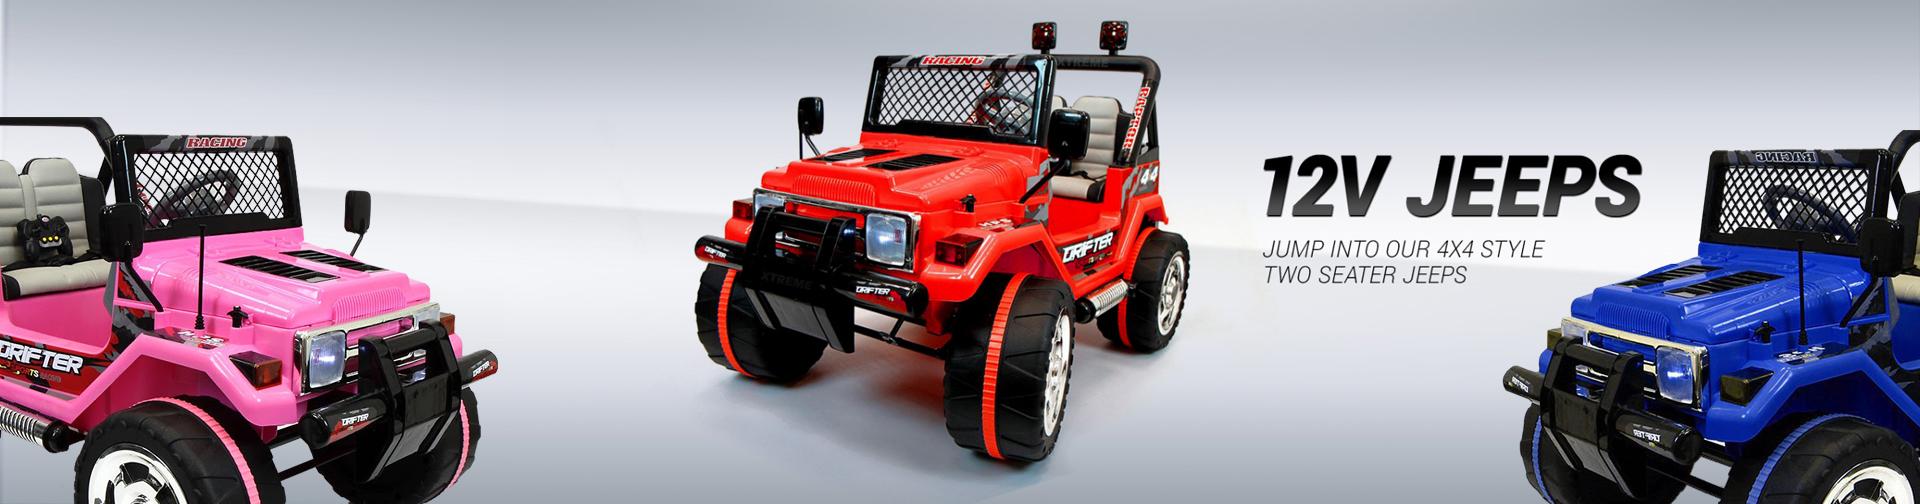 12V Off-Road Jeep